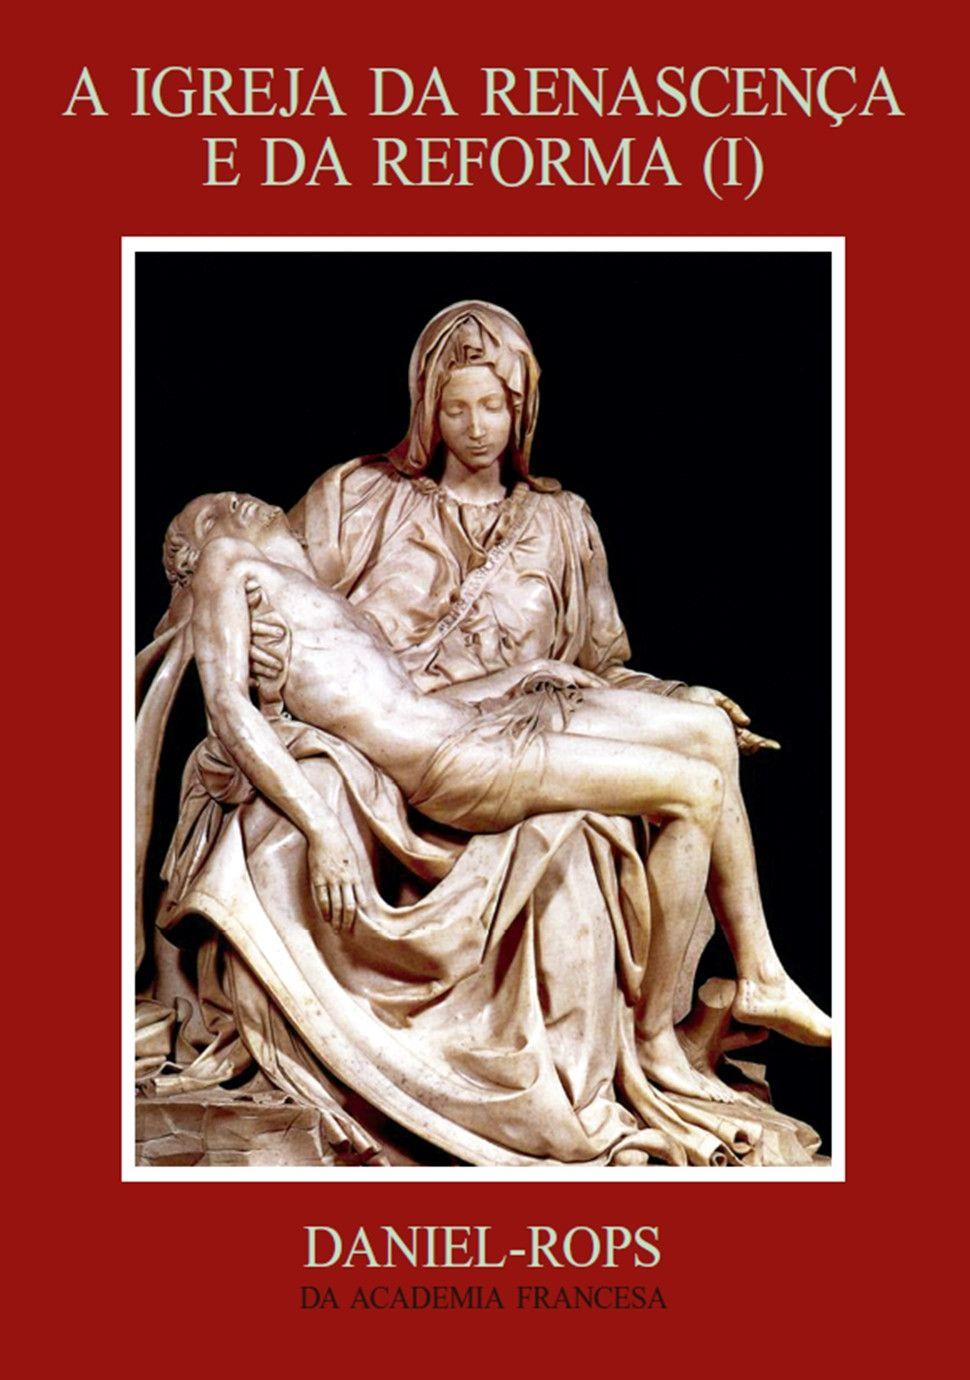 Livro HI-04 - A Igreja da renascença e da reforma (I)